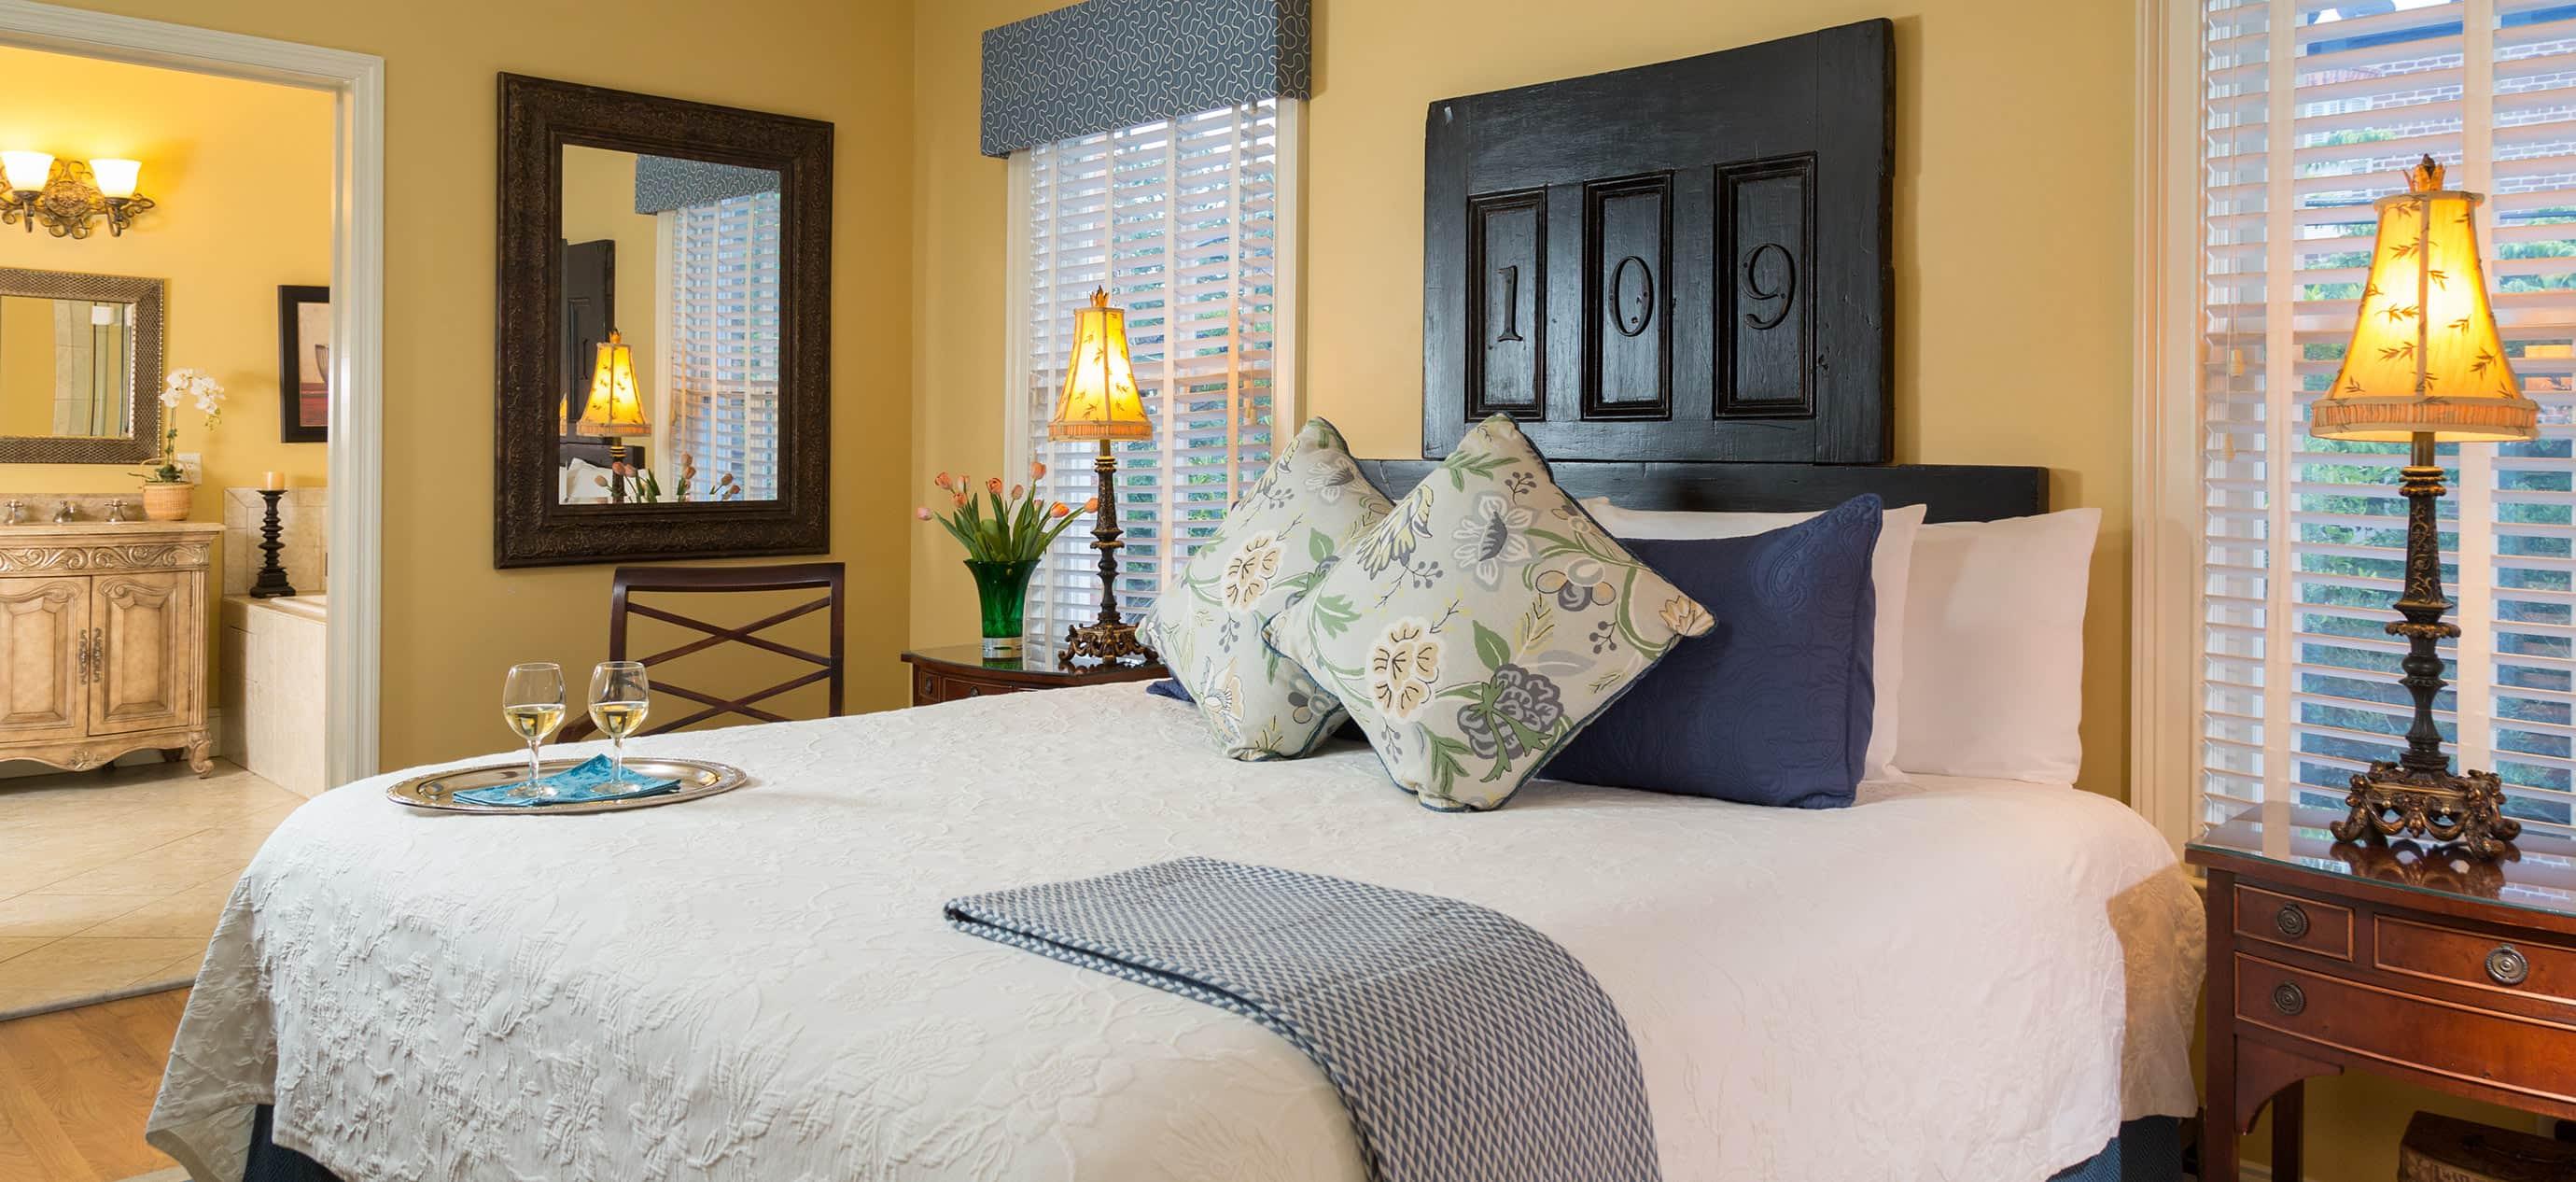 Historic hotel room in Savannah, GA